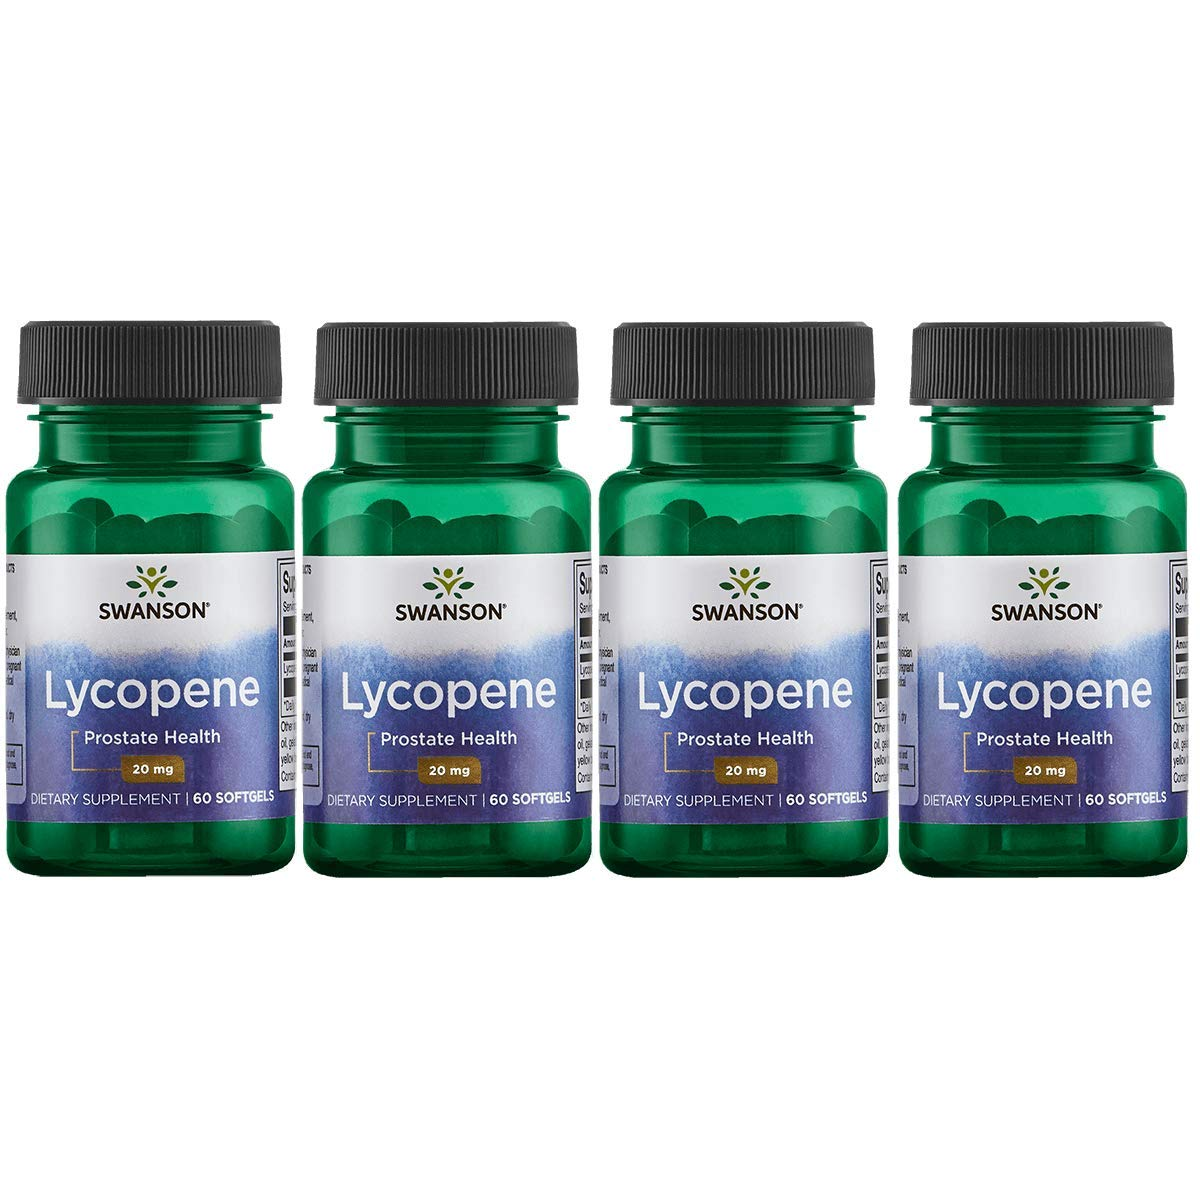 Swanson Lycopene Supplement, Prostate Health Supplement 20 mg, 60 Softgels (4 Pack)